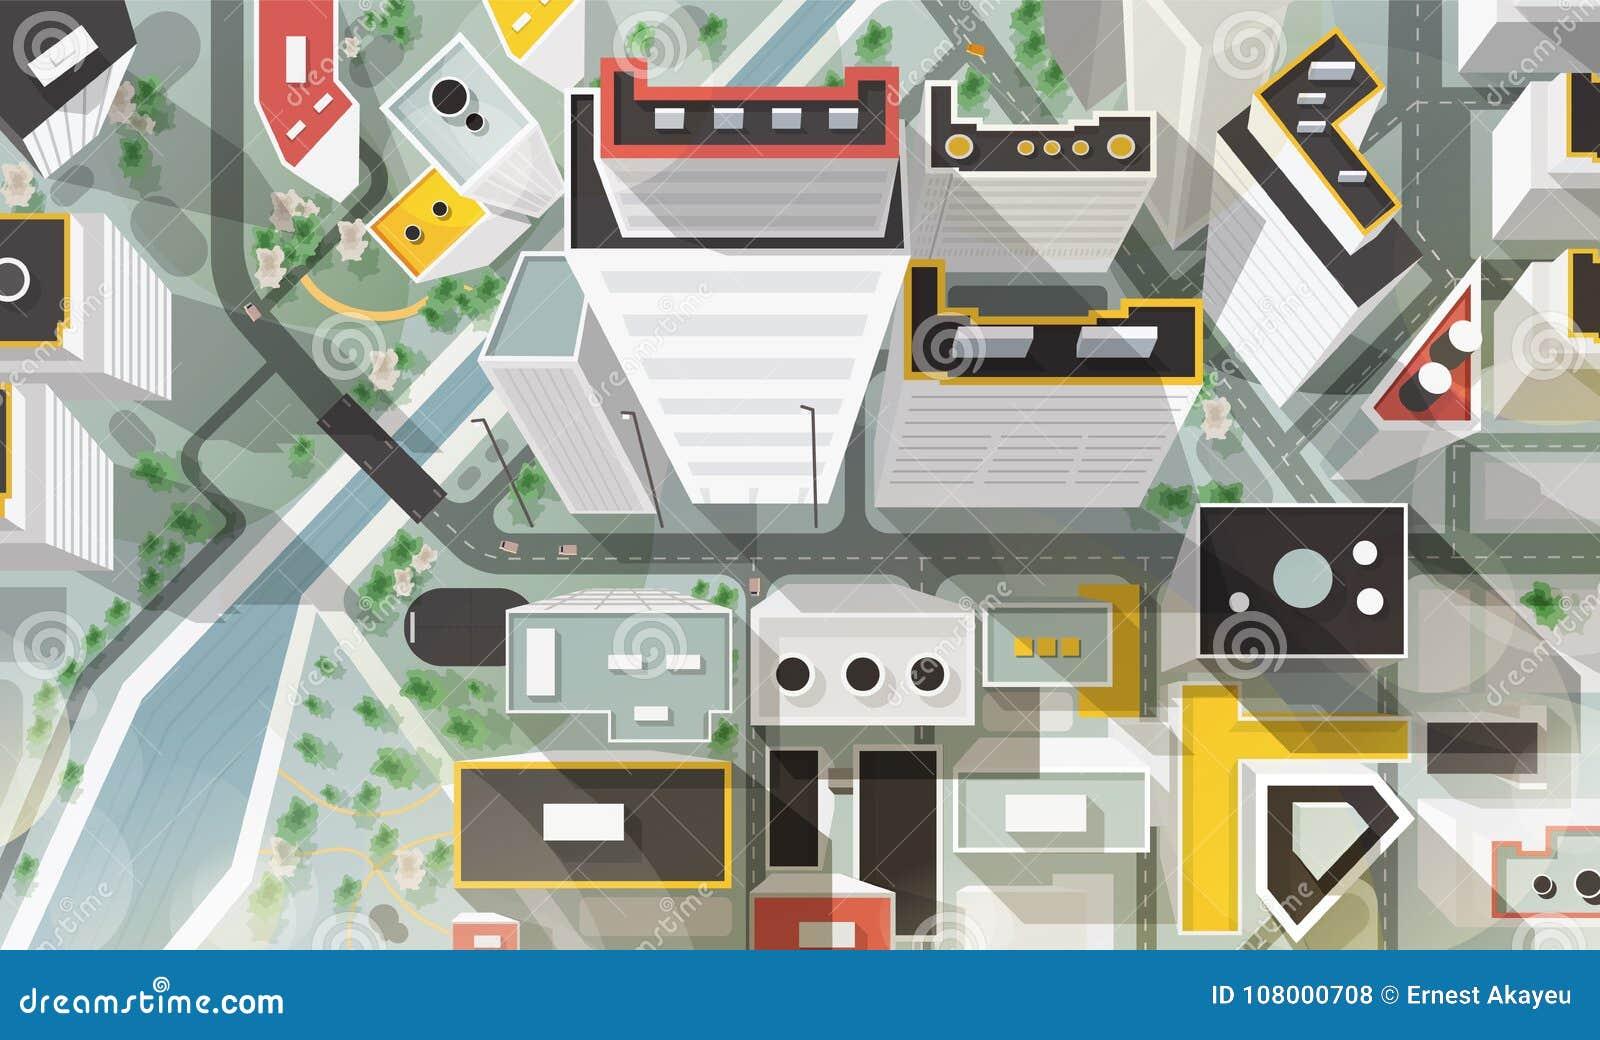 Bovenkant, antenne of vogels oogmening van stad met gebouwen van moderne architectuur, wolkenkrabbers, straten, rivier en brug